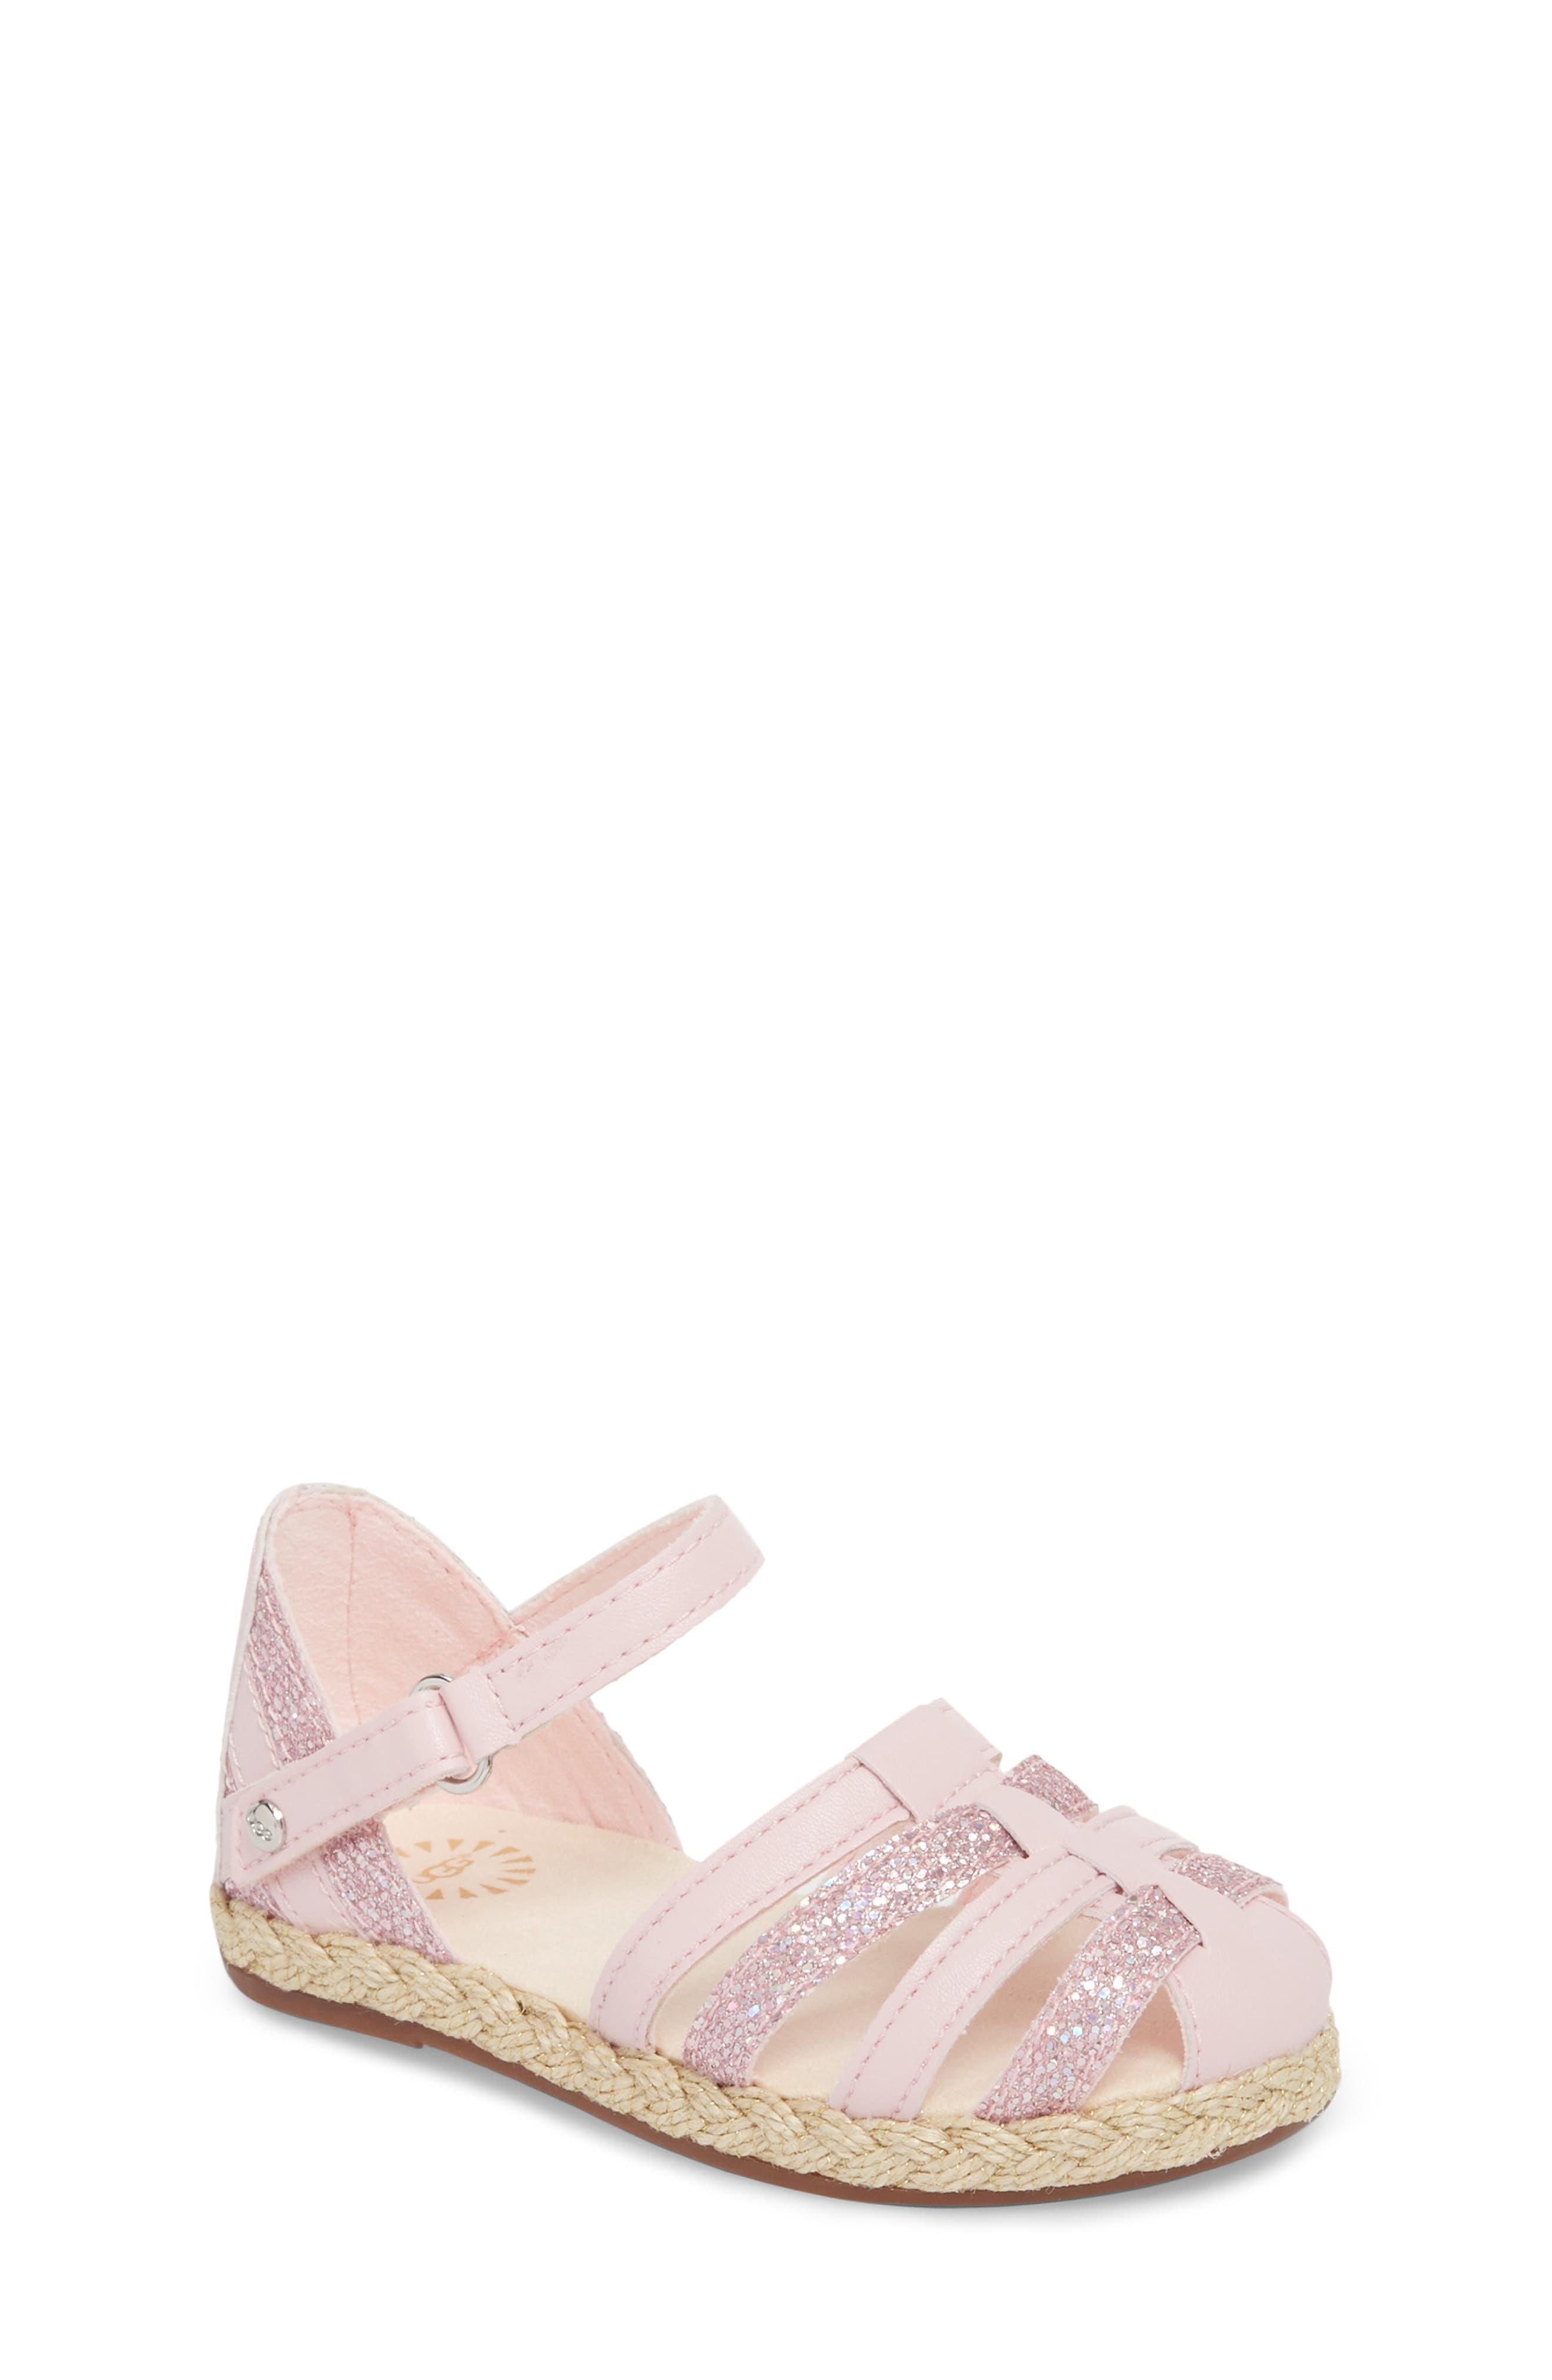 Matilde Espadrille Sandal,                             Main thumbnail 1, color,                             Seashell Pink